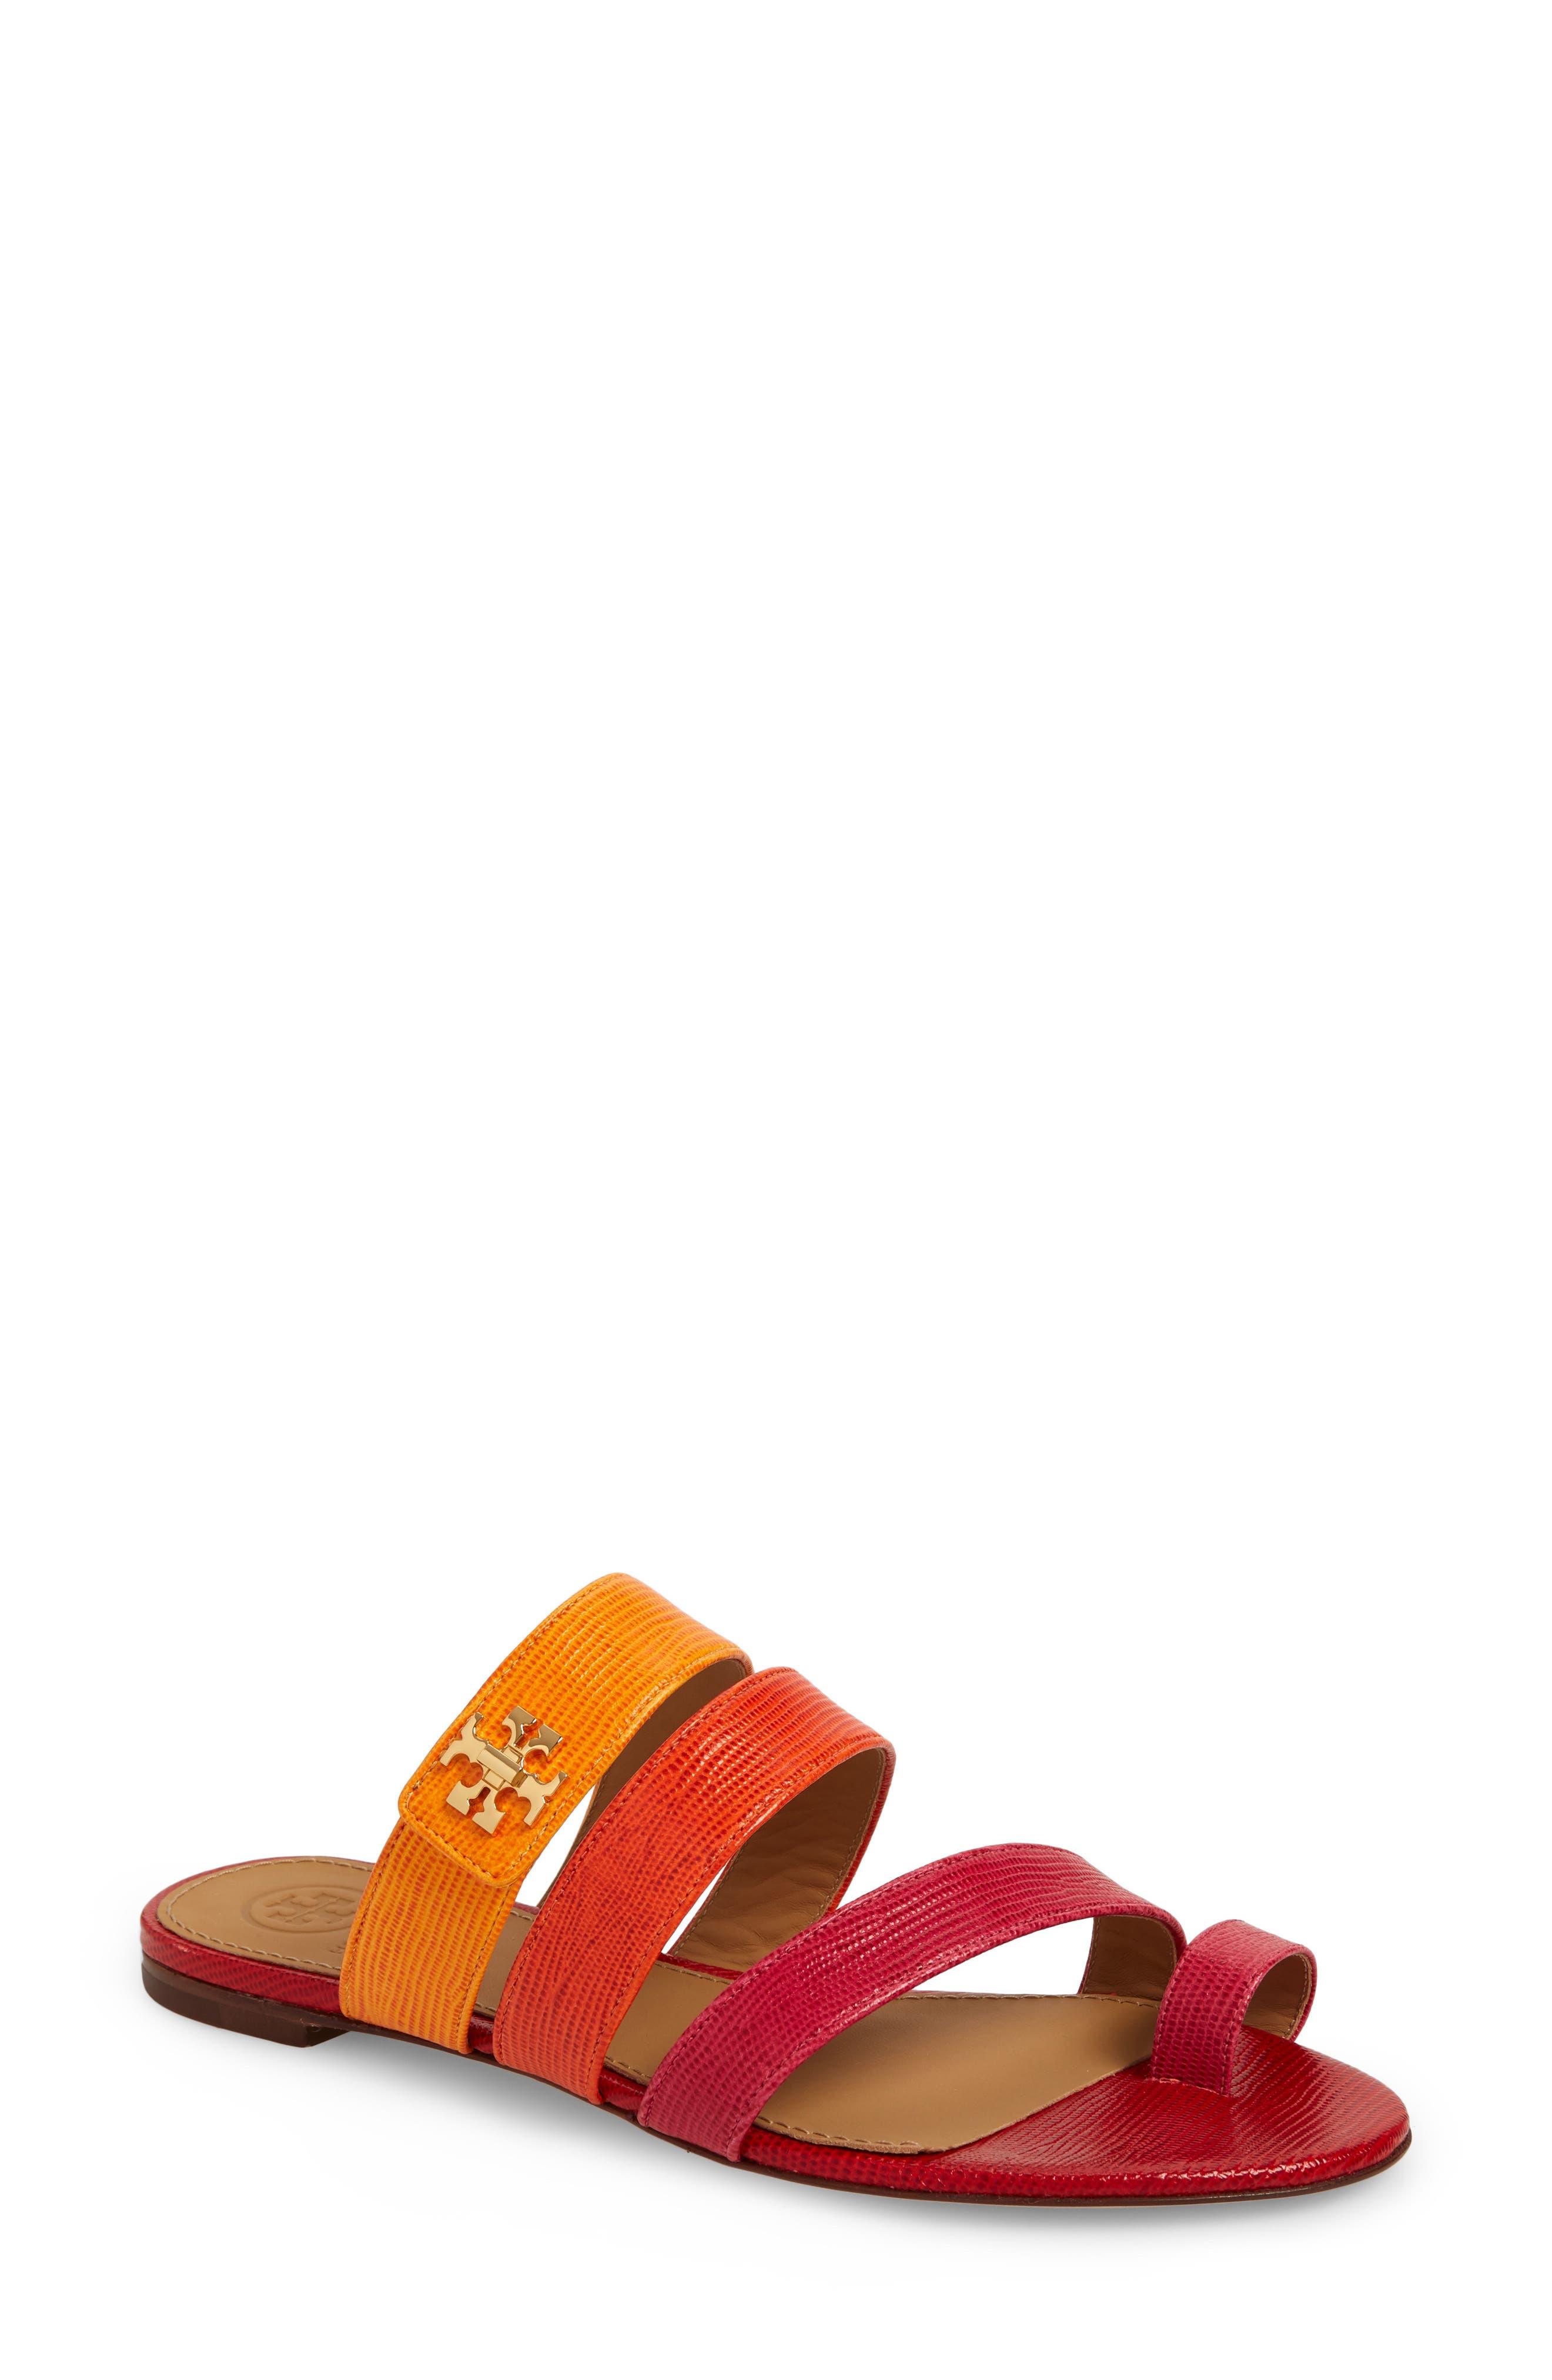 Tory Burch Kira Toe Ring Sandal, Pink